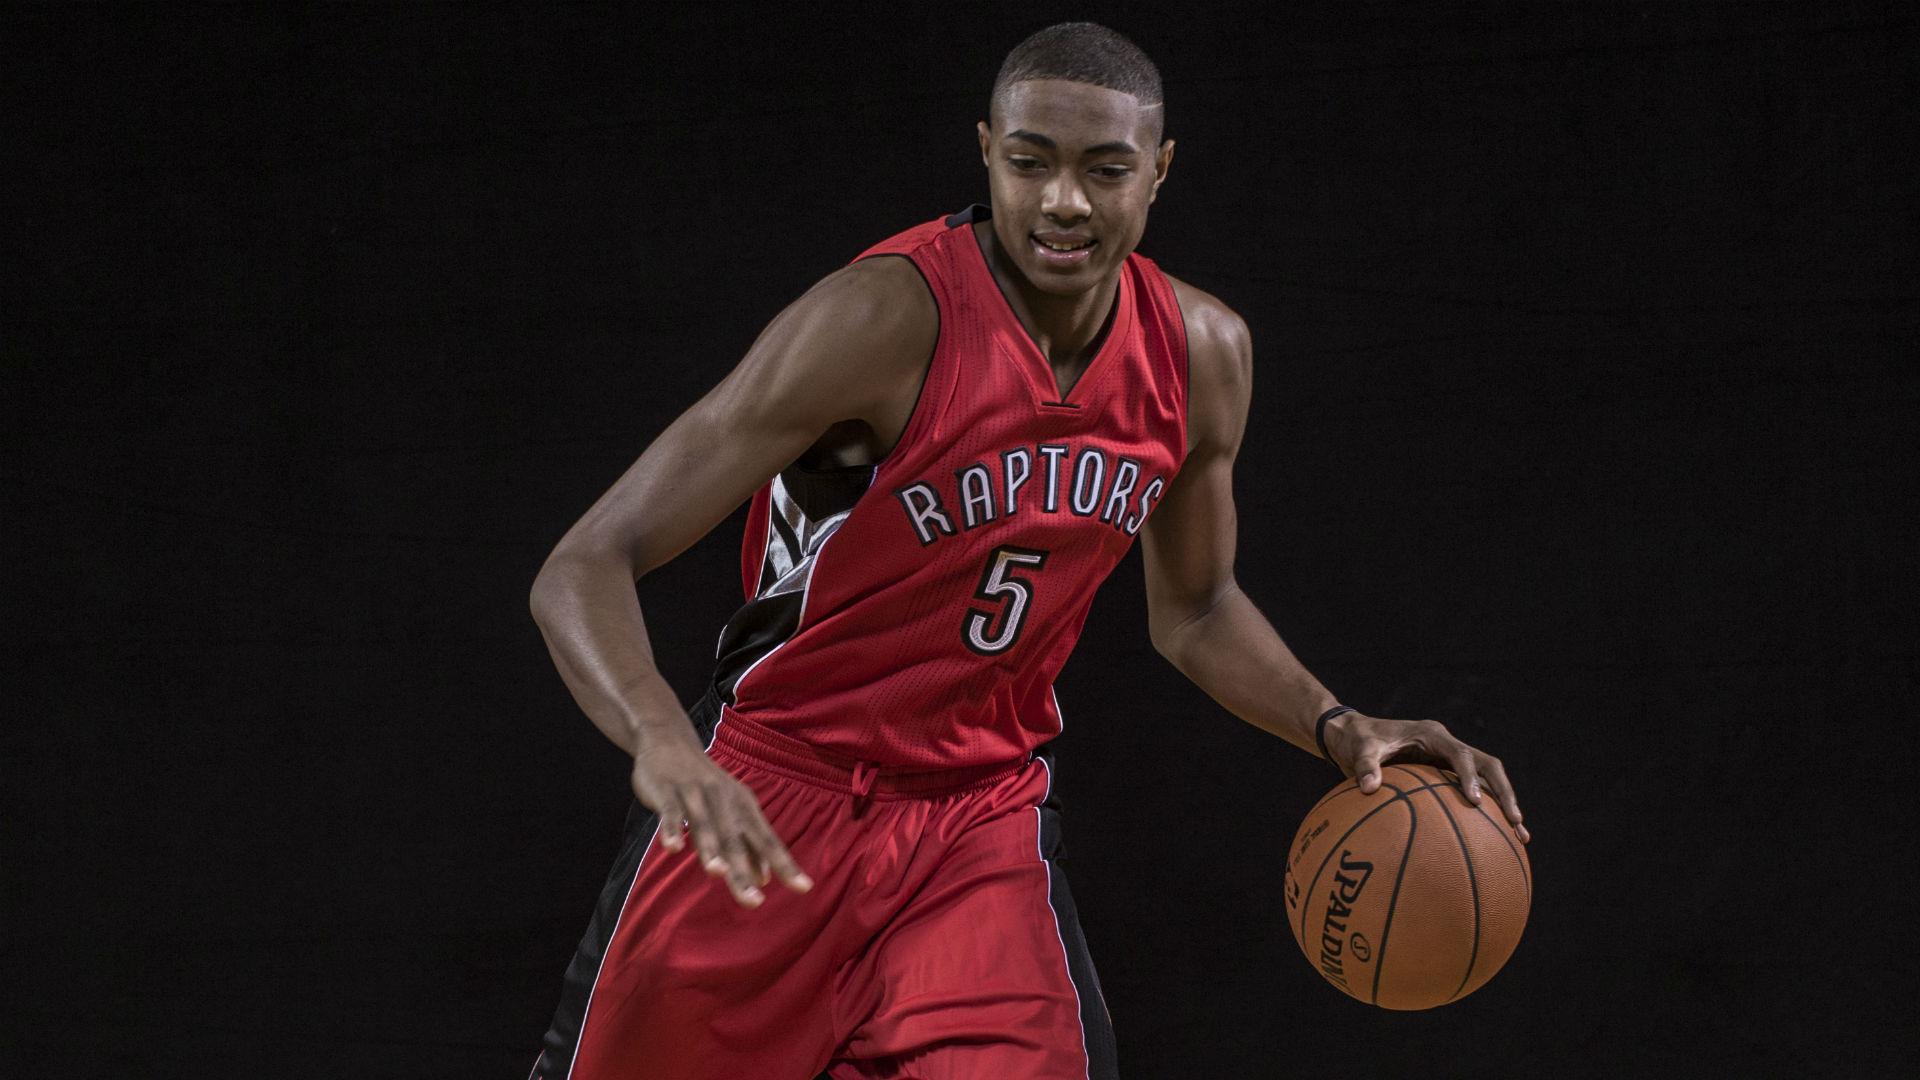 Raptors acquiring shooting guard Malachi Richardson